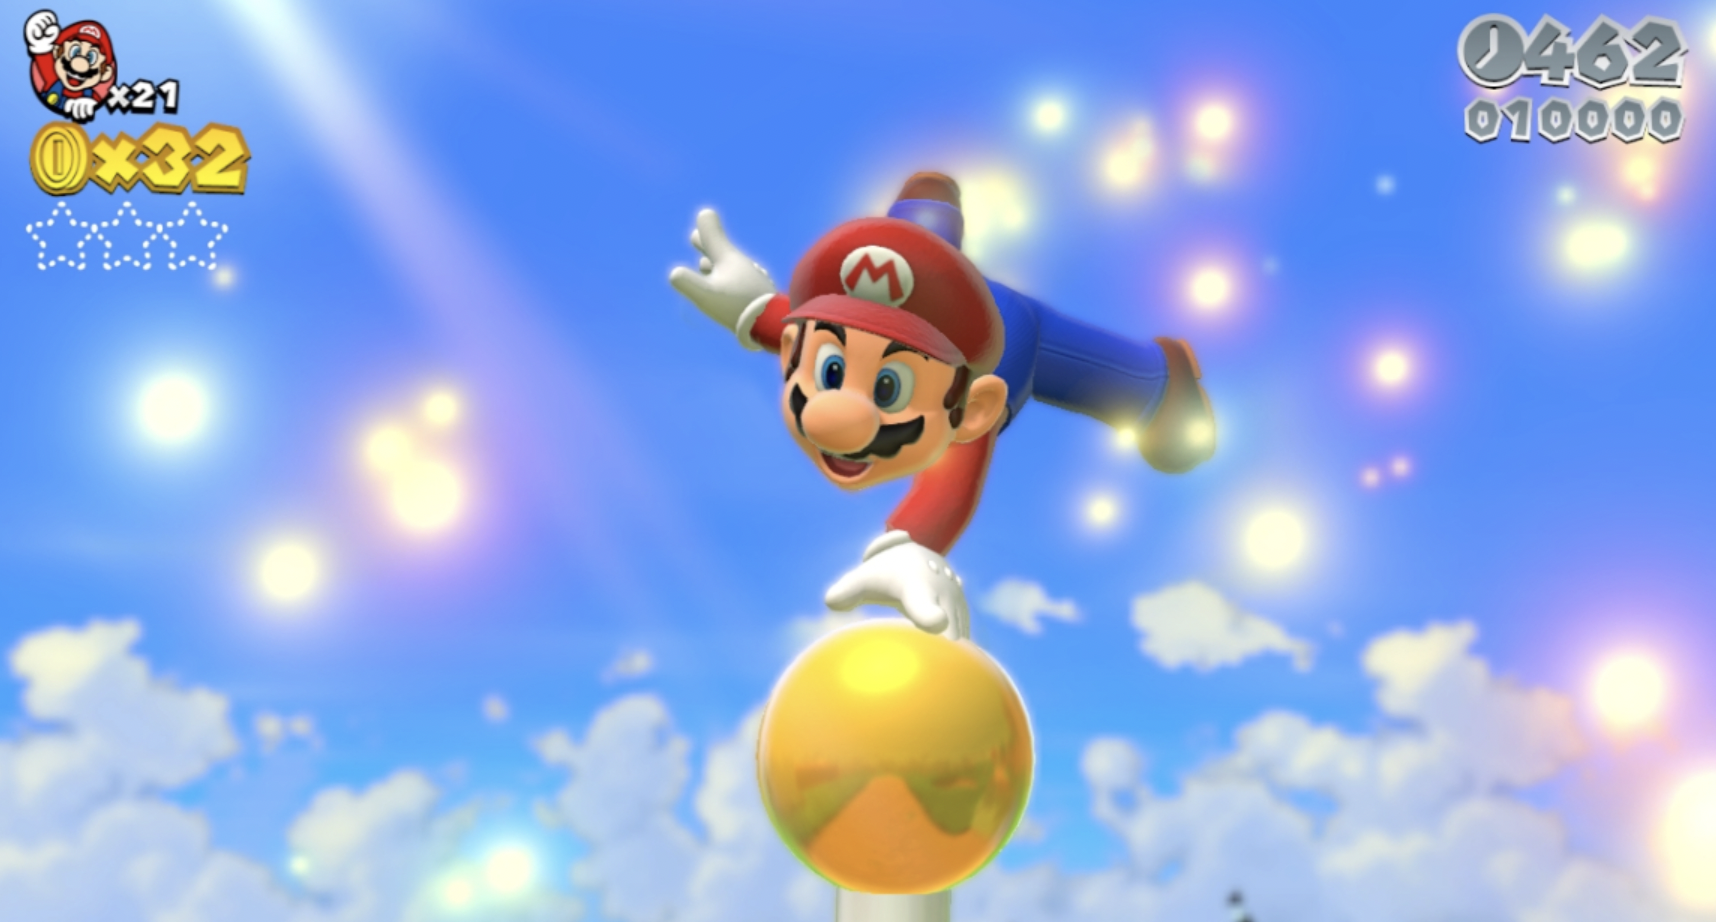 Super Mario 3D World Deluxe Release Date